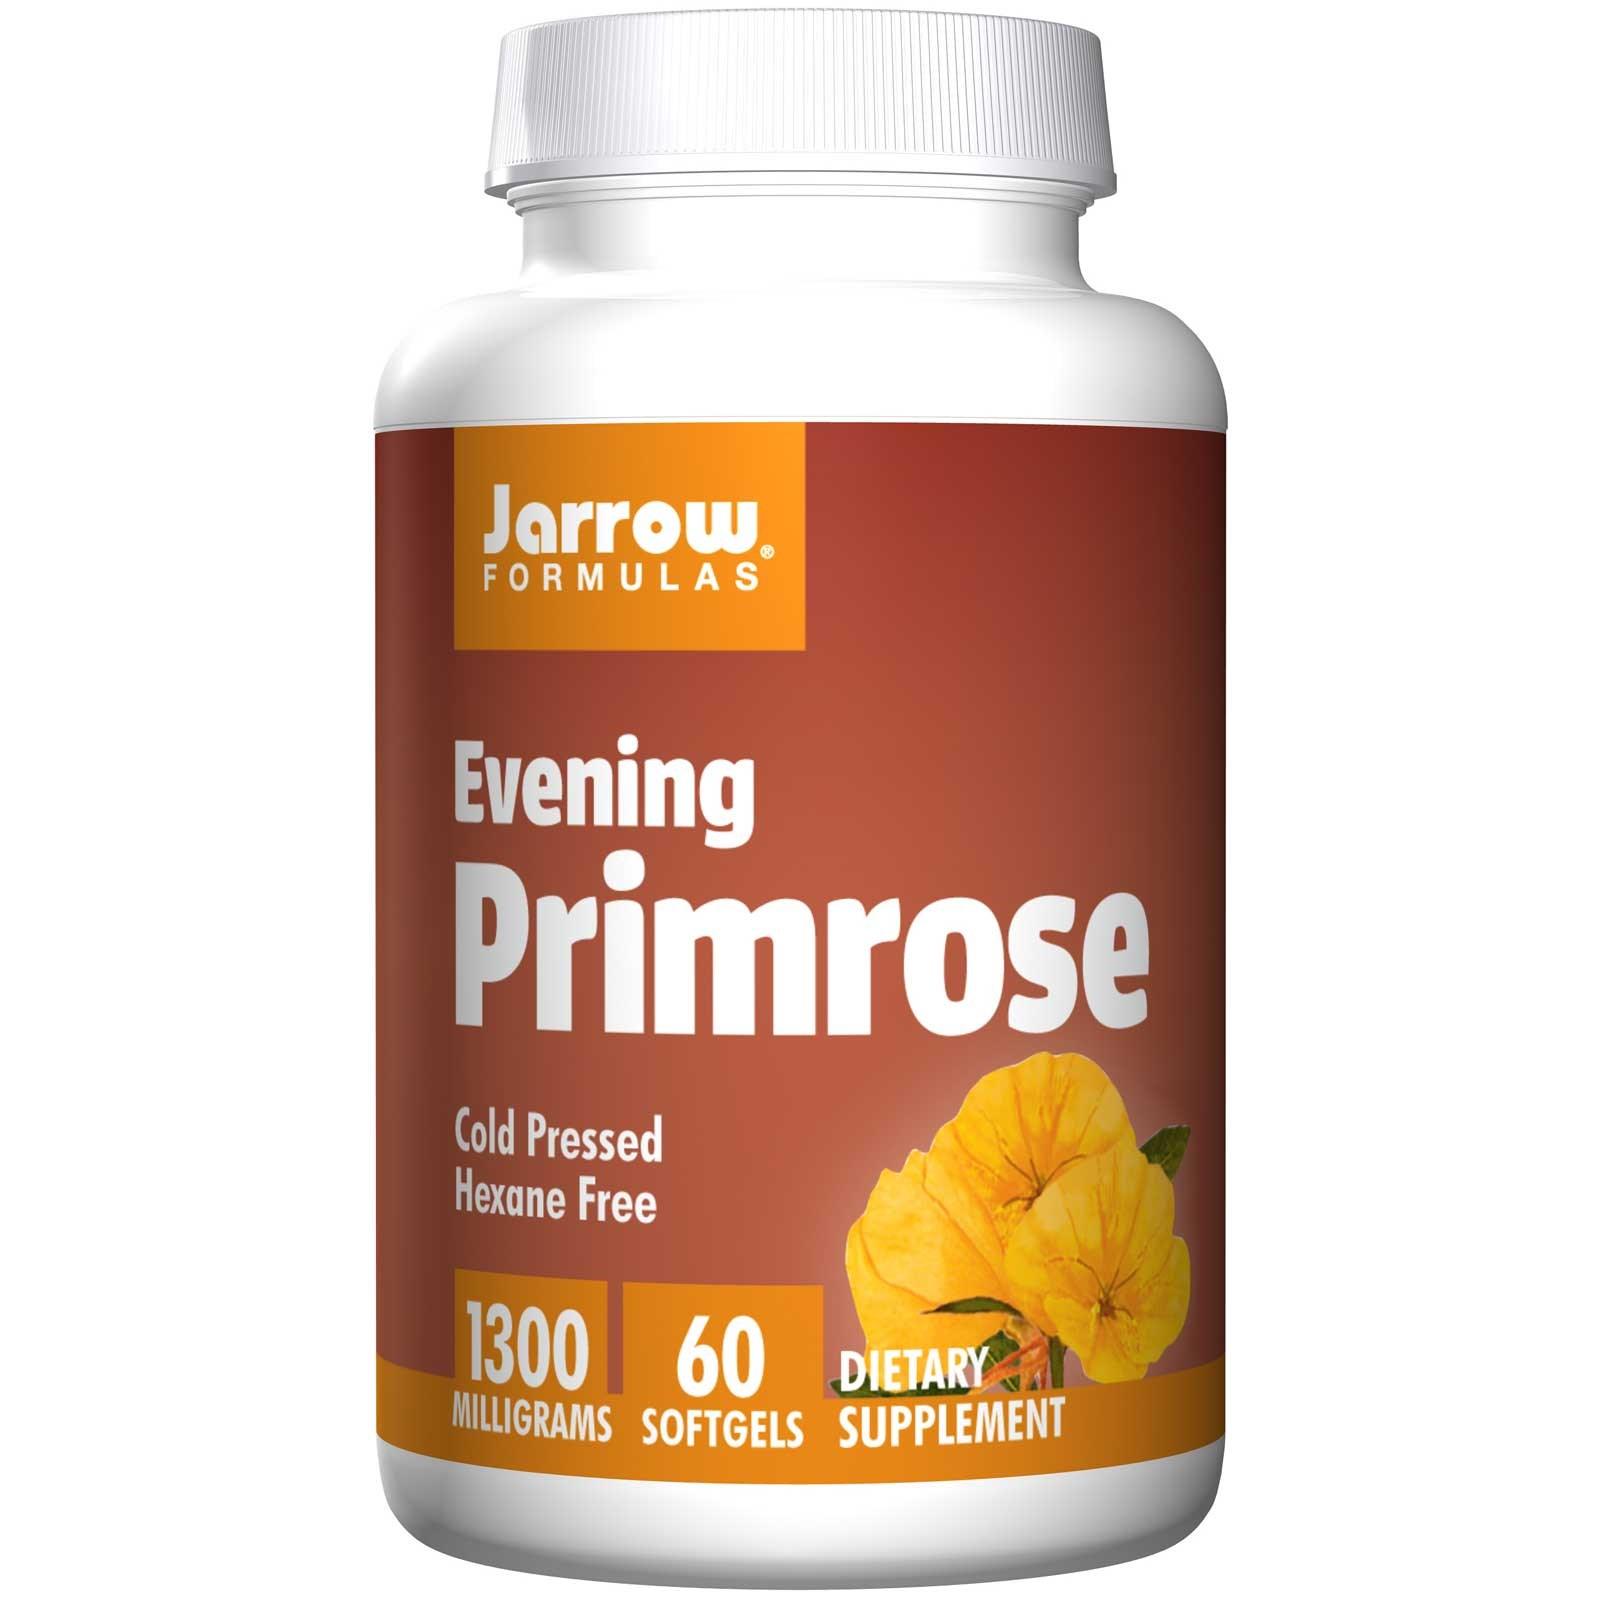 Evening Primrose 1300 mg (60 Softgels) Jarrow Formulas